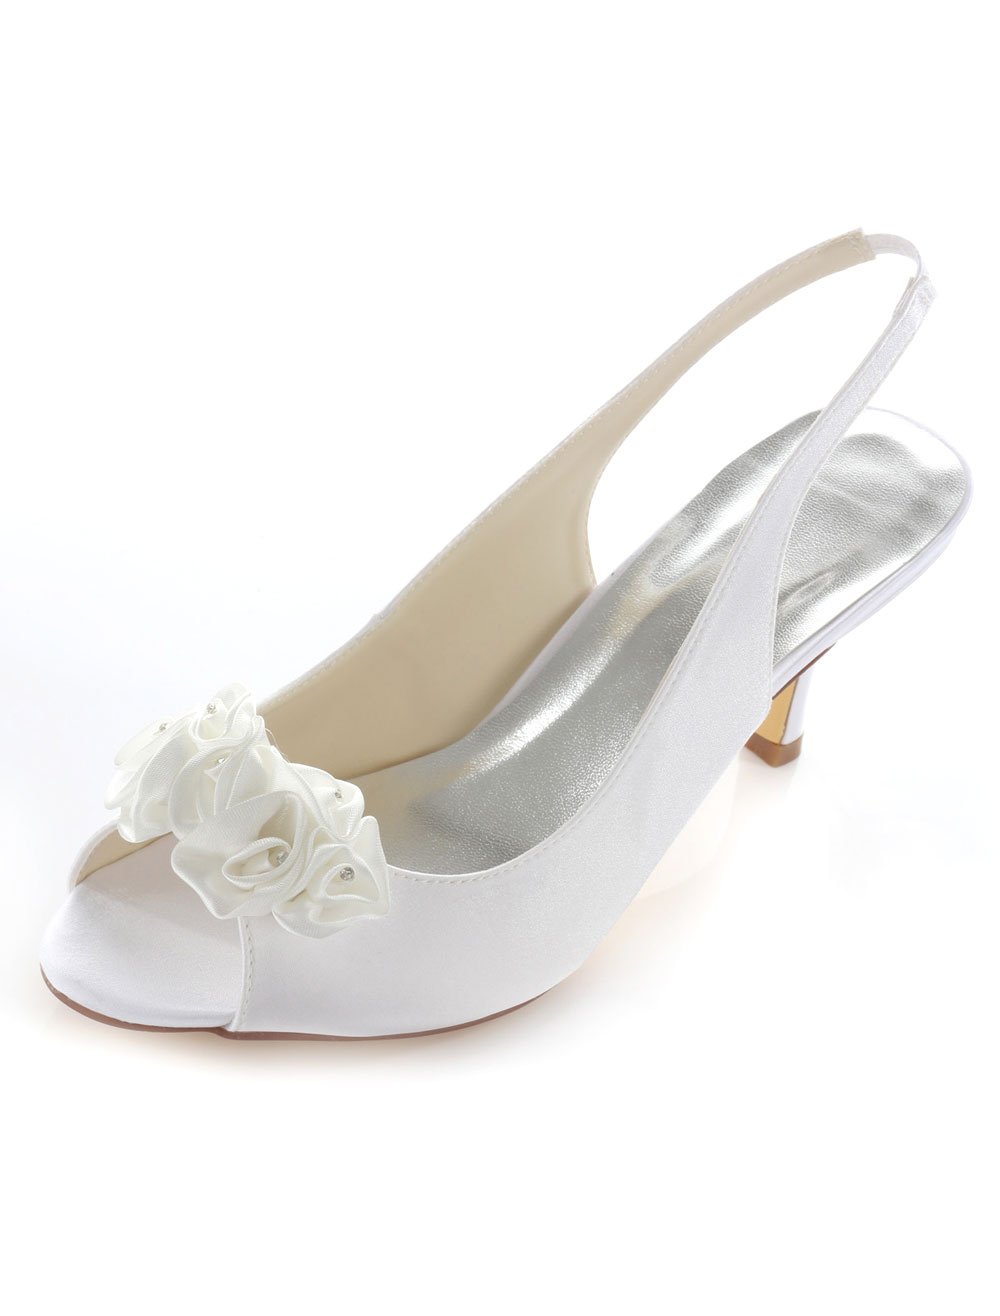 Ivory Rhinestone Flower Peep Toe Satin Evening and Bridal Sandals